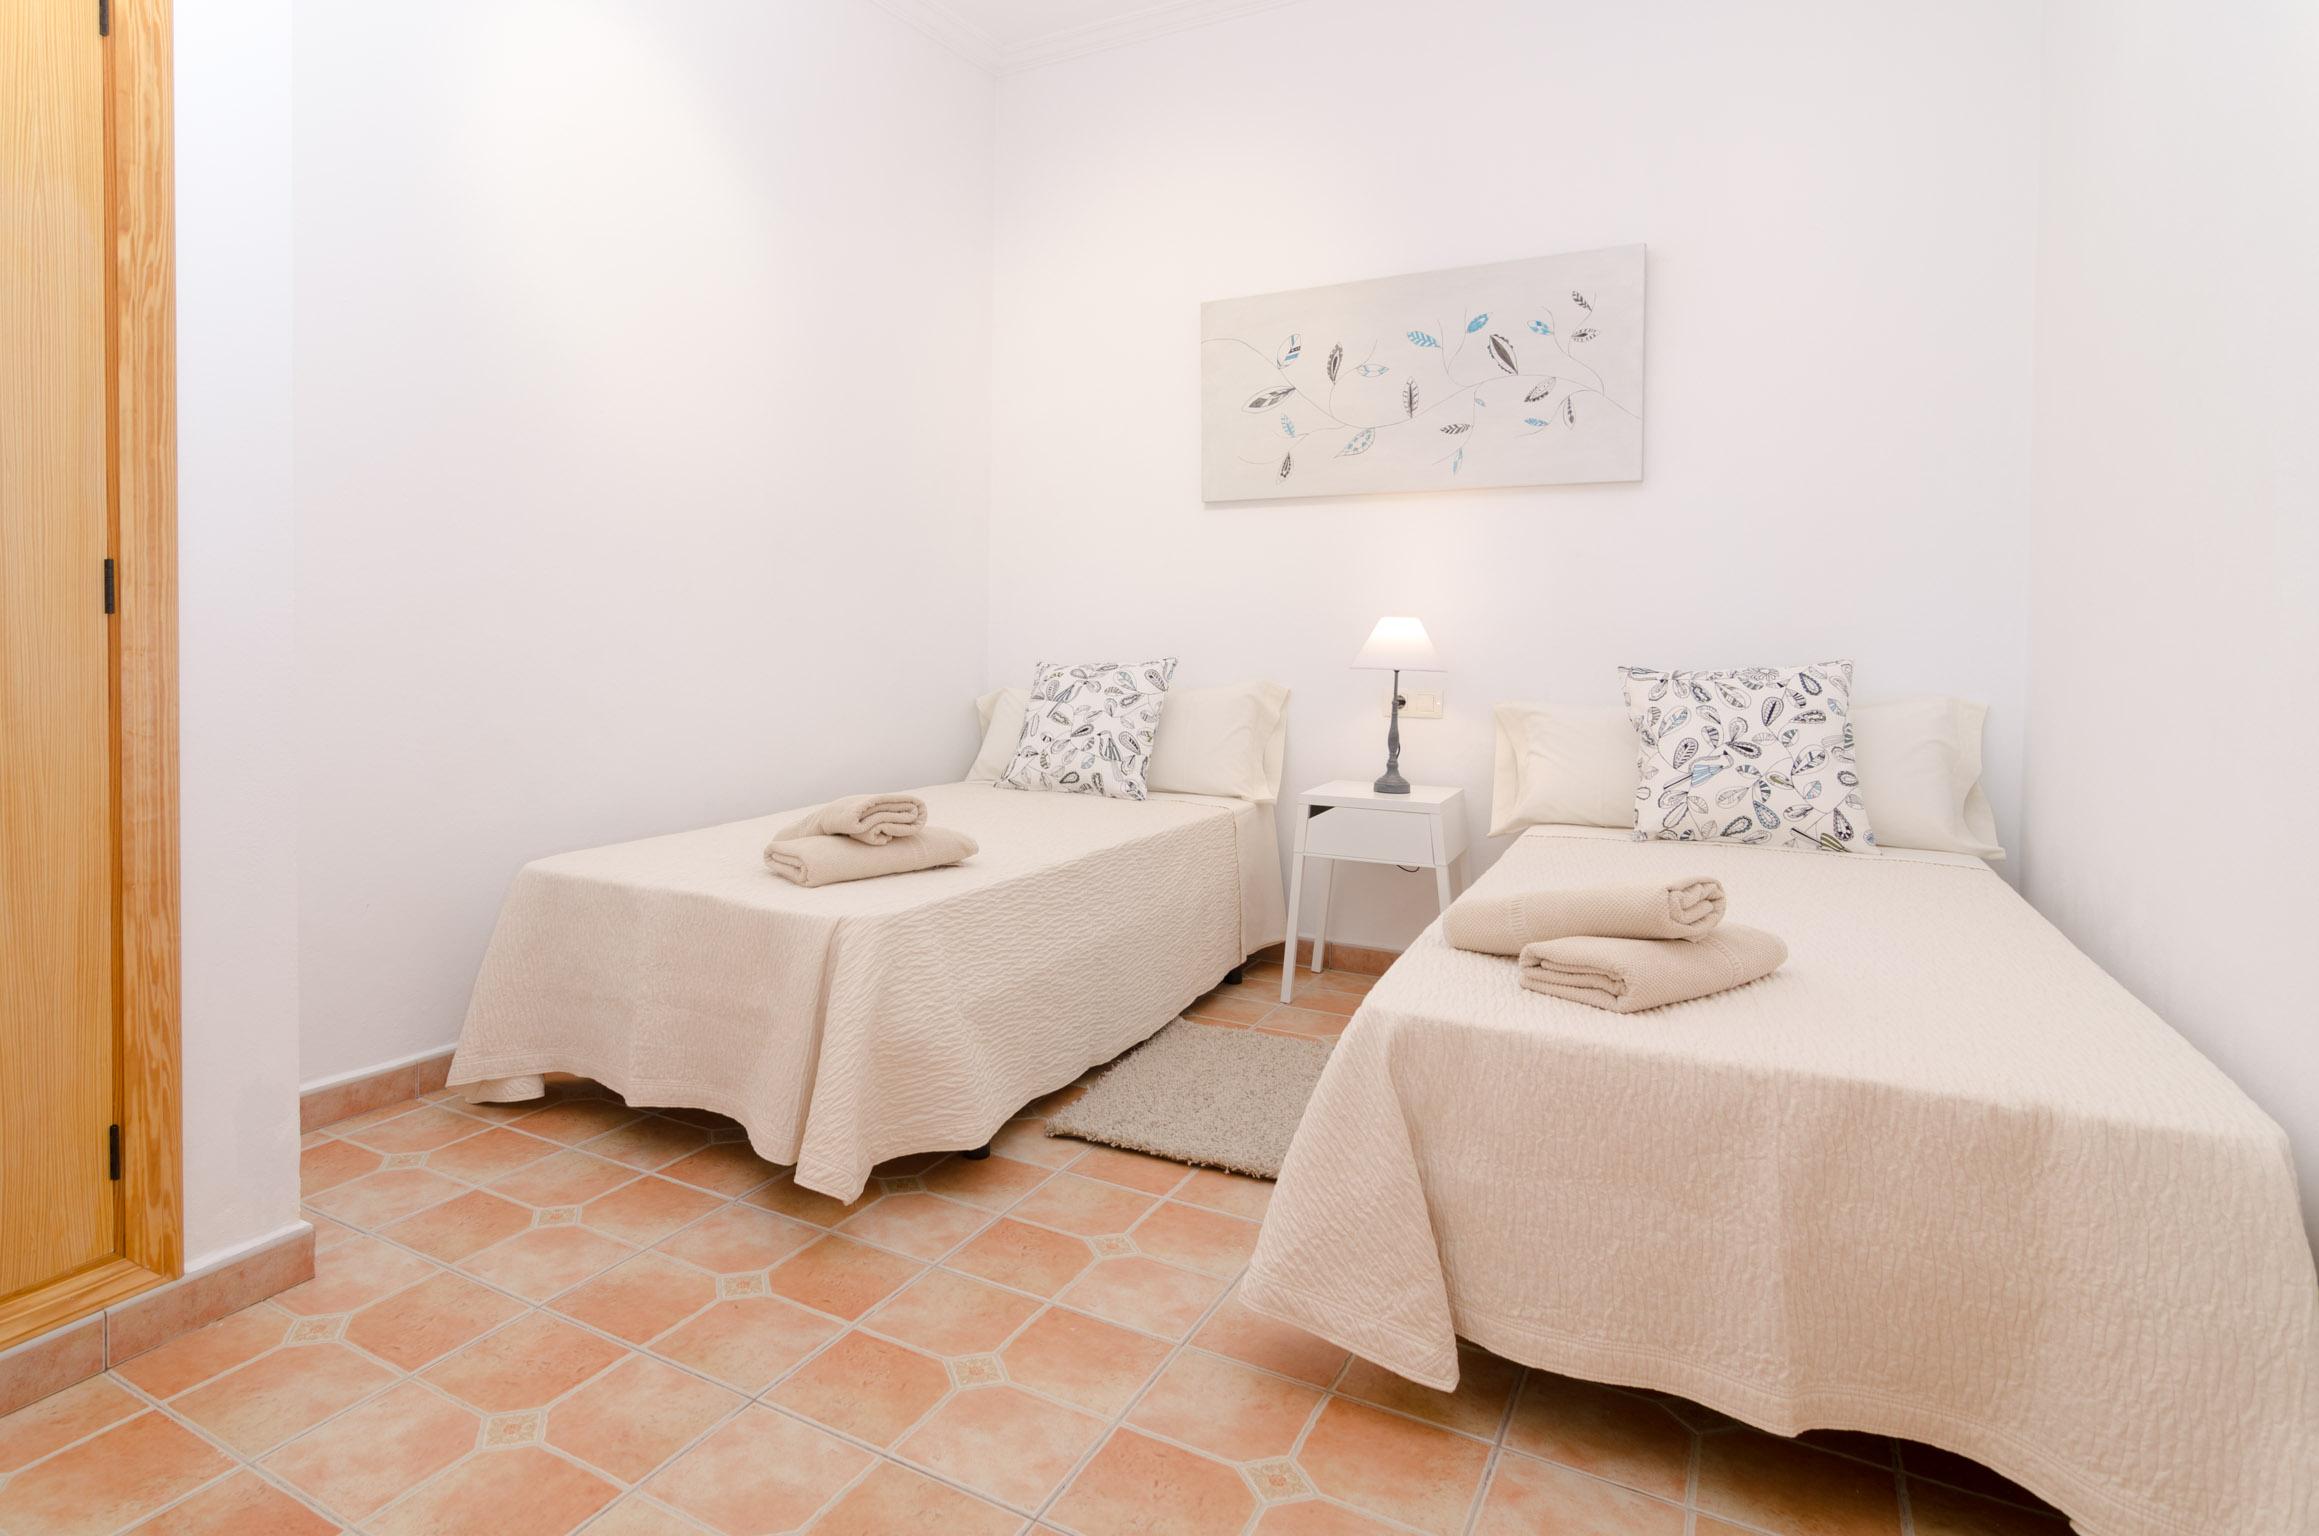 Ferienhaus SANT BLAI VELL (2284789), Campos, Mallorca, Balearische Inseln, Spanien, Bild 21